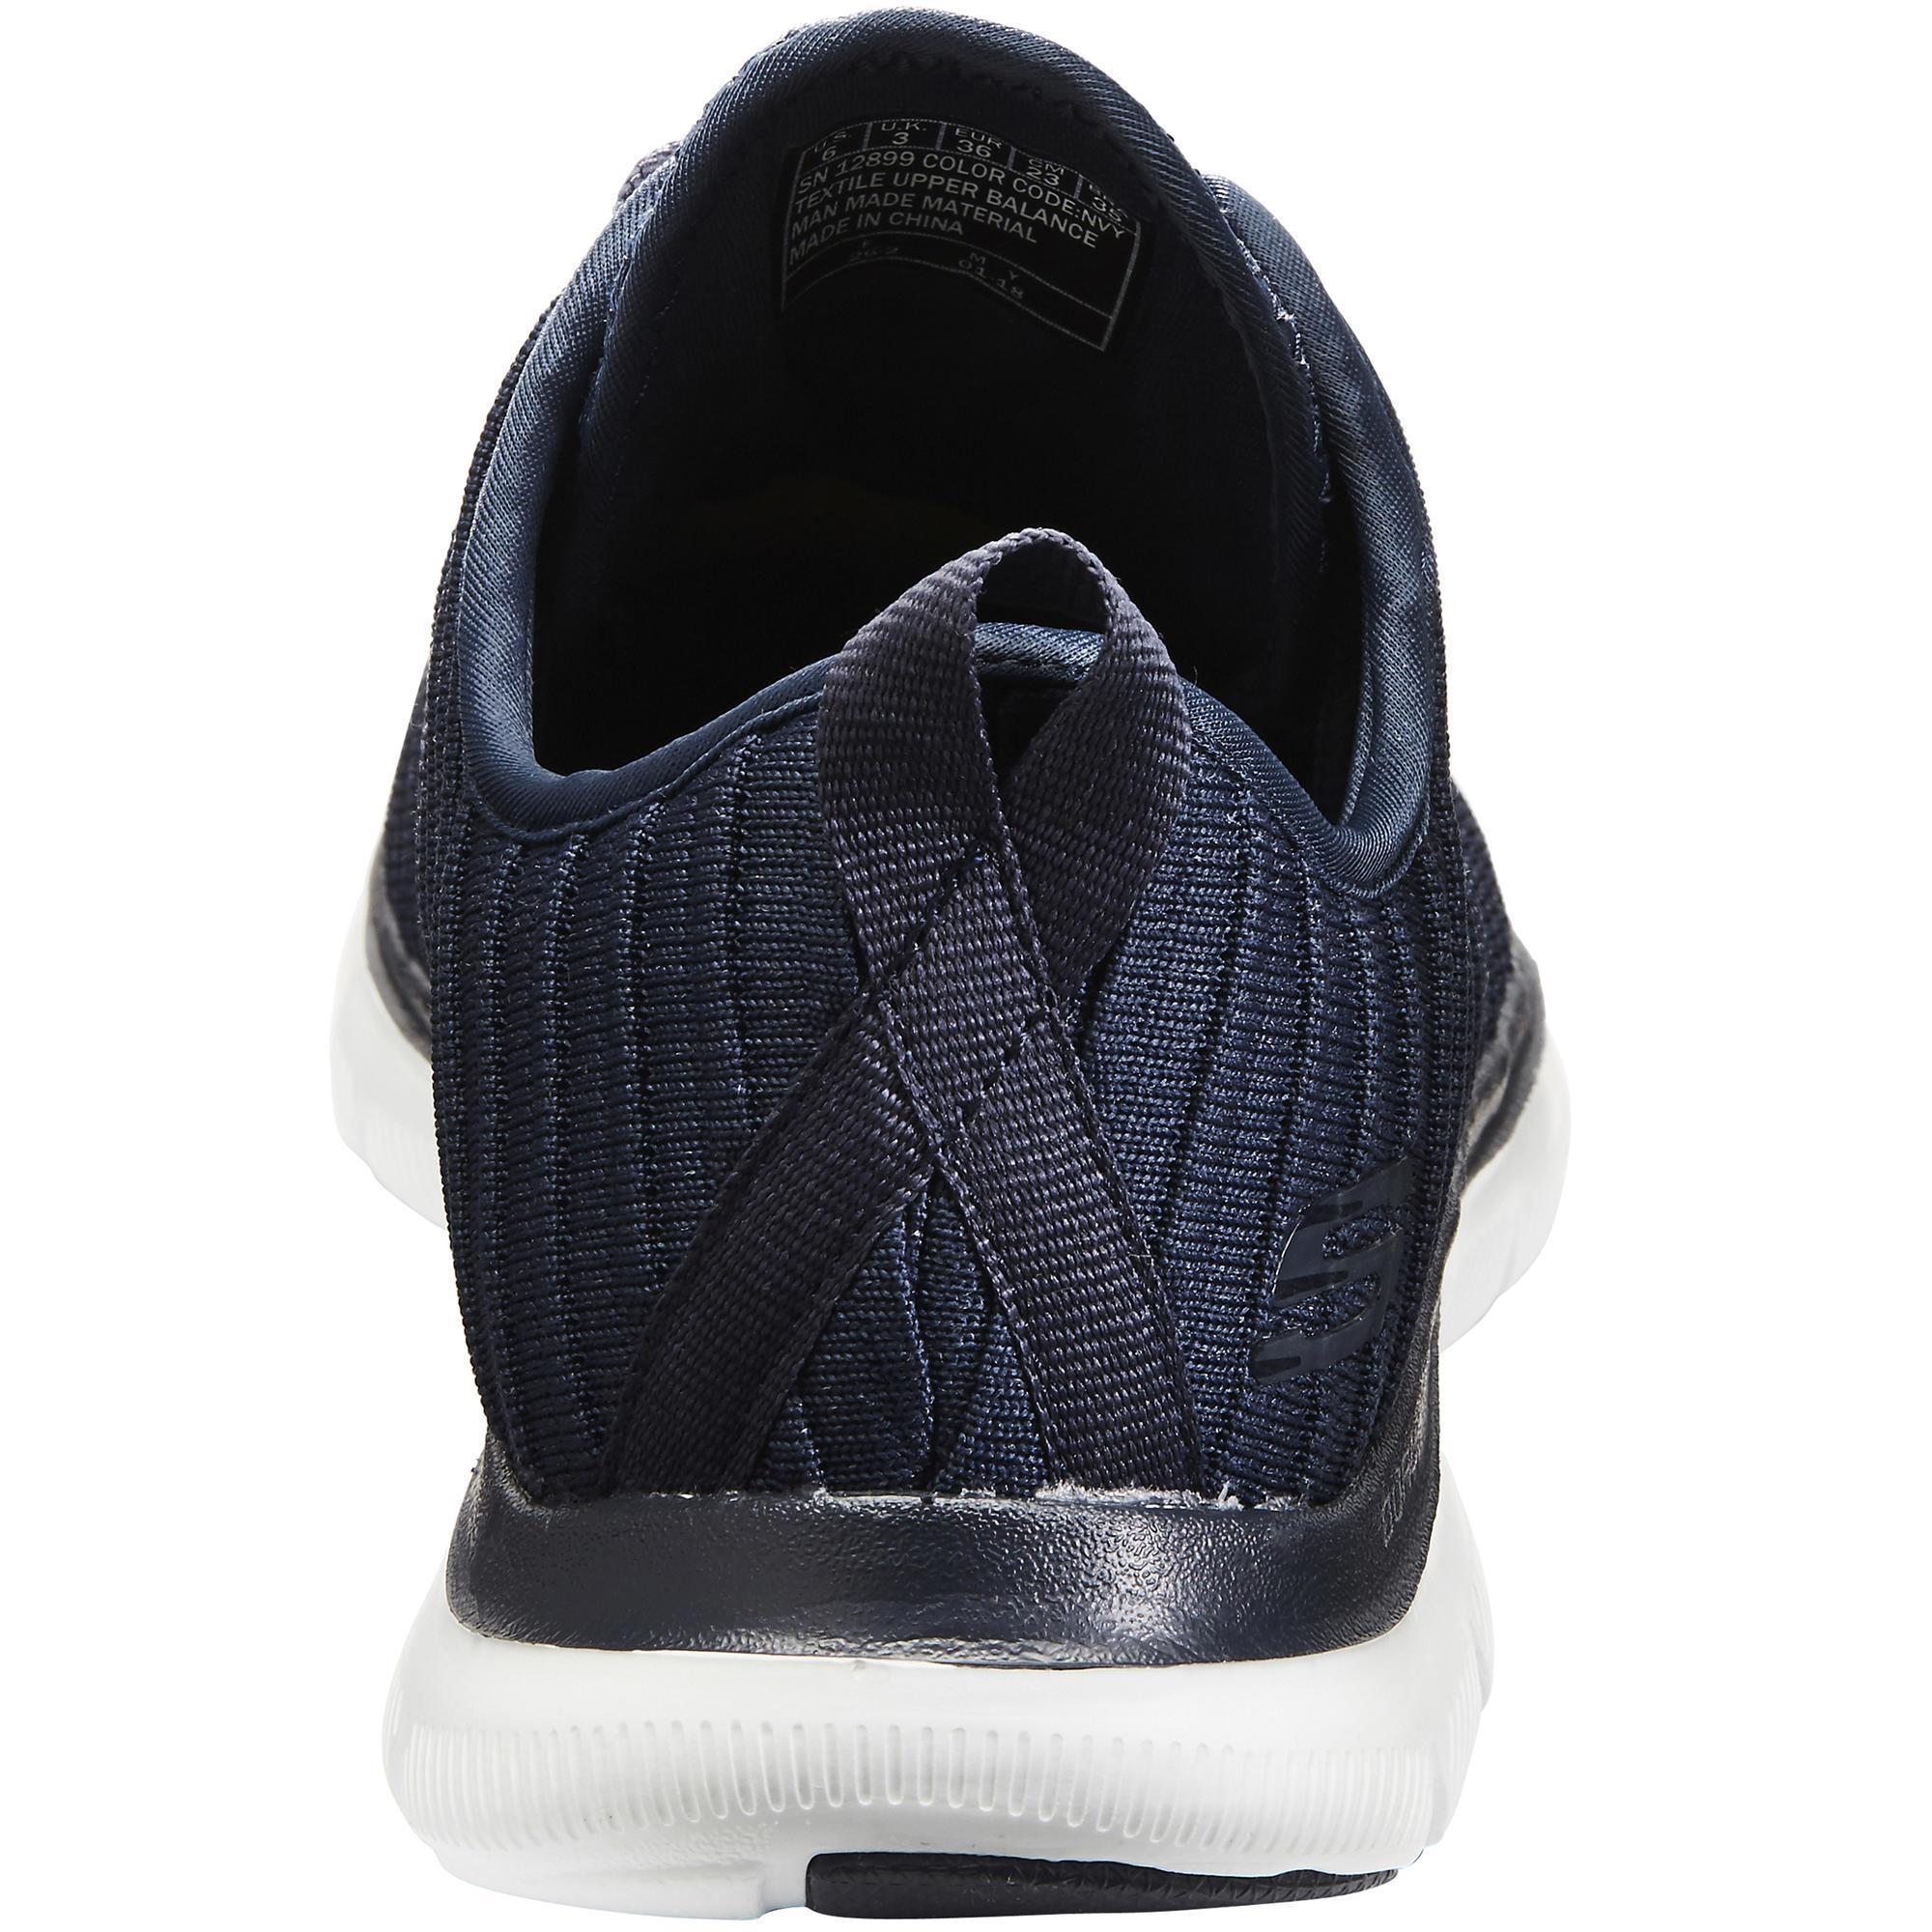 detailed look 75723 0518b Flex Decathlon Marche Appeal Skechers Femme Chaussures Sportive Bleu zPdqP